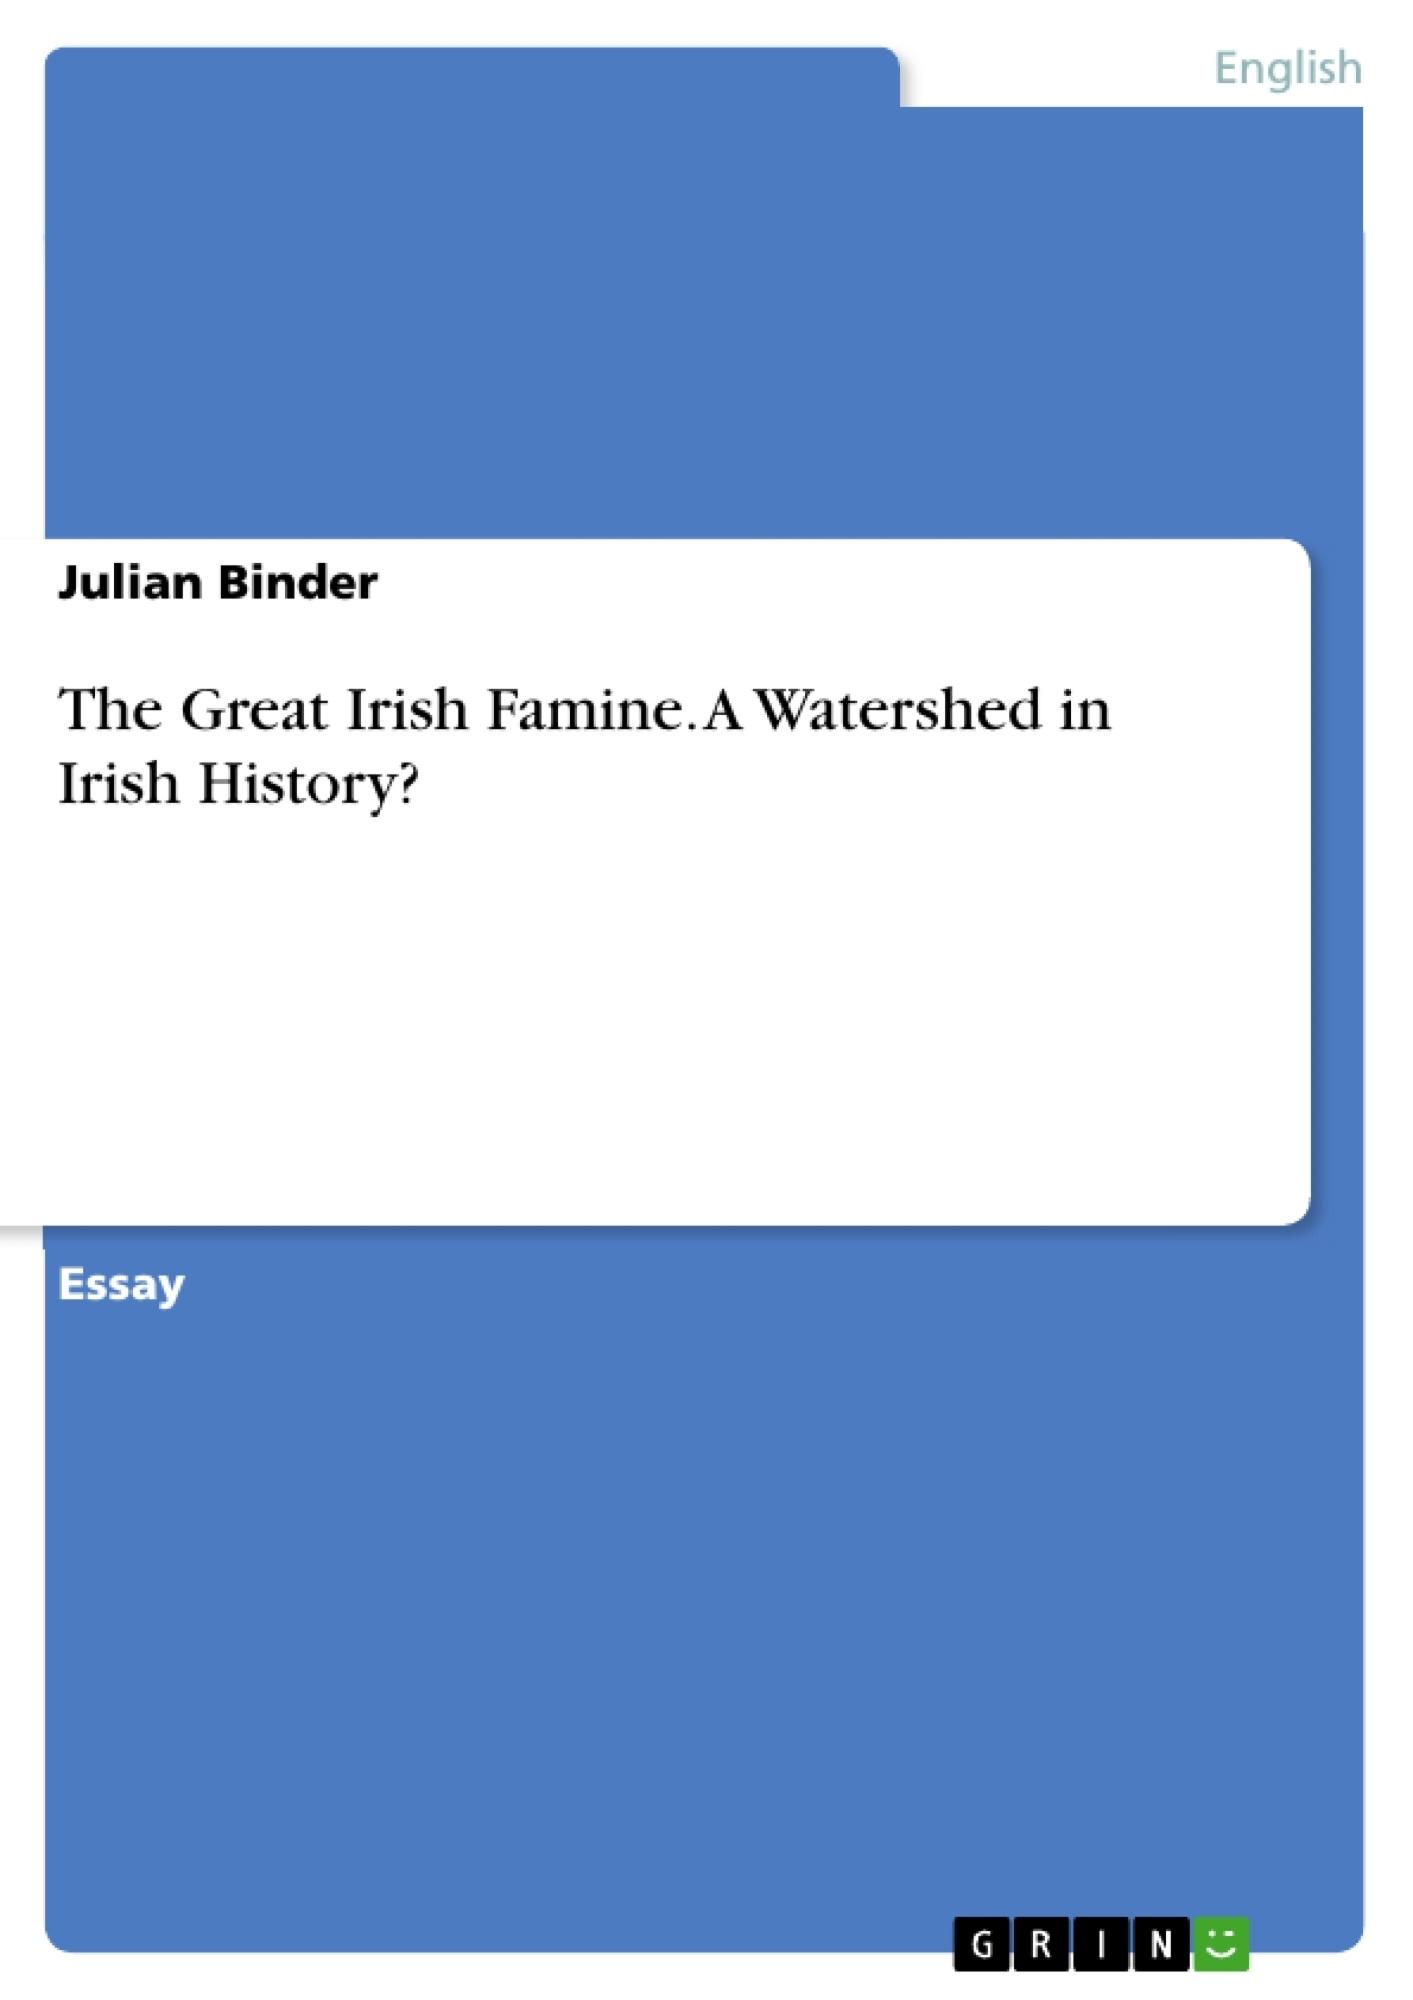 Title: The Great Irish Famine. A Watershed in Irish History?